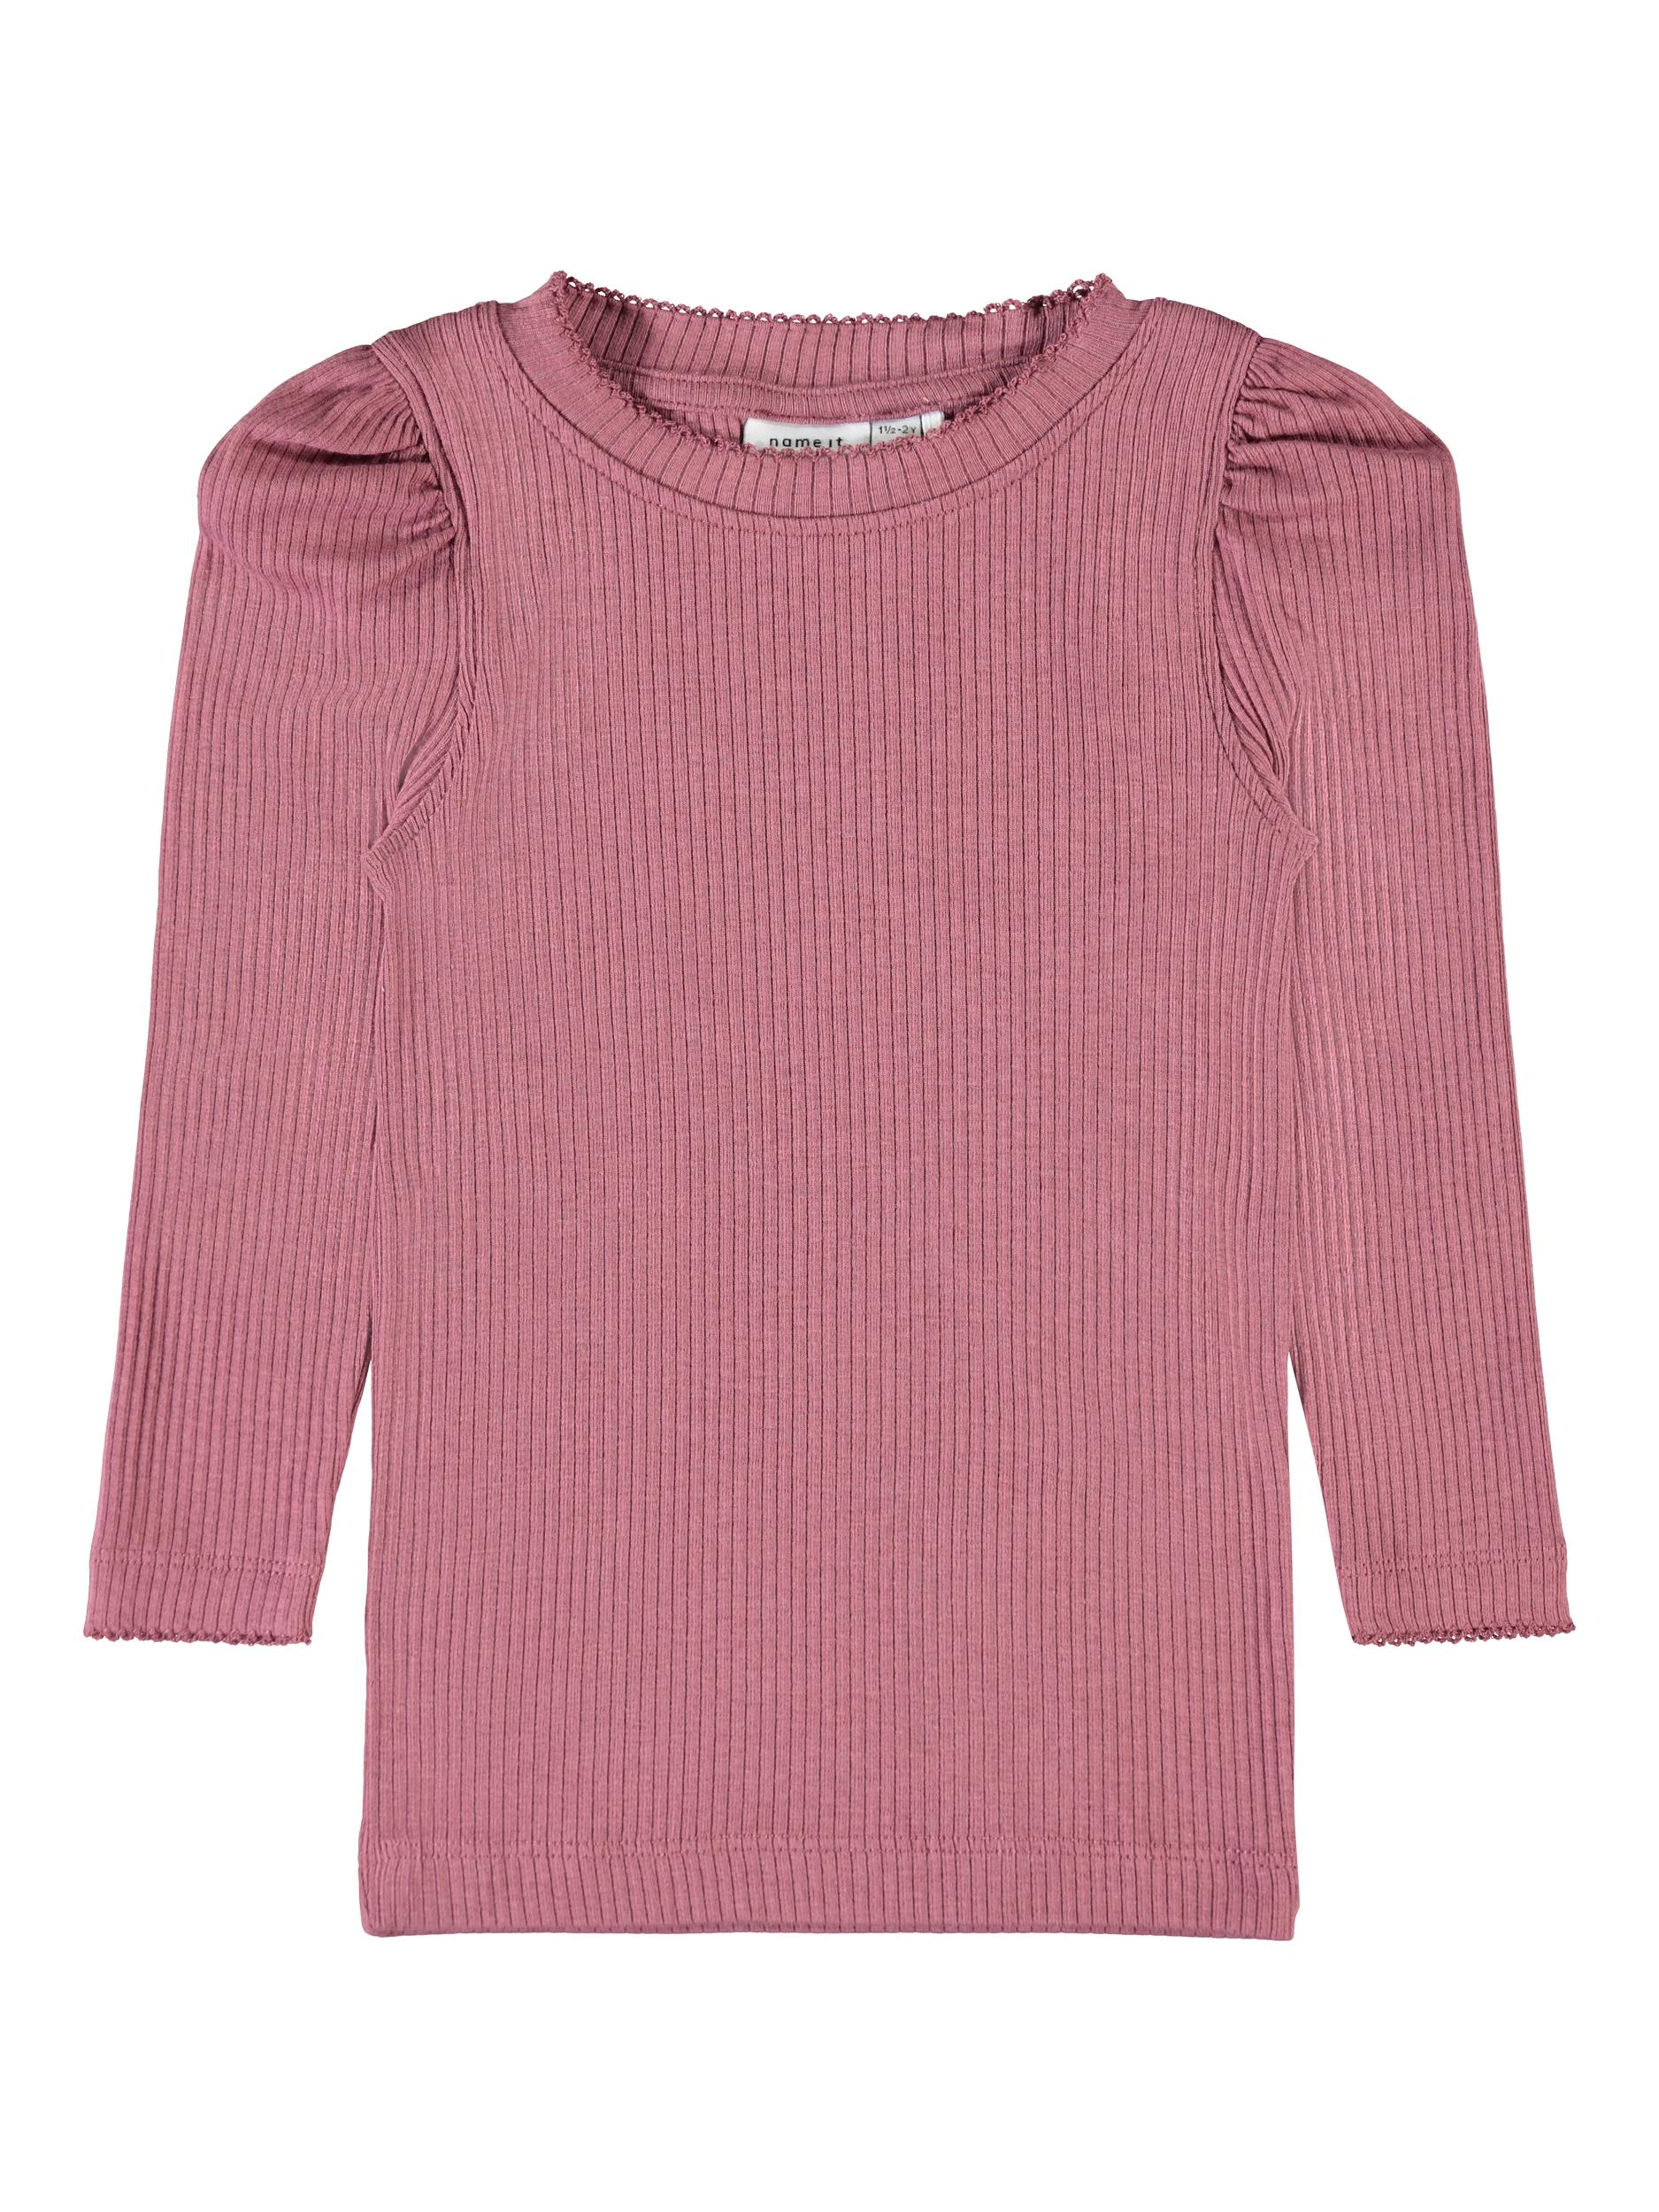 Name It Kabexi bluse, deco rose, 110